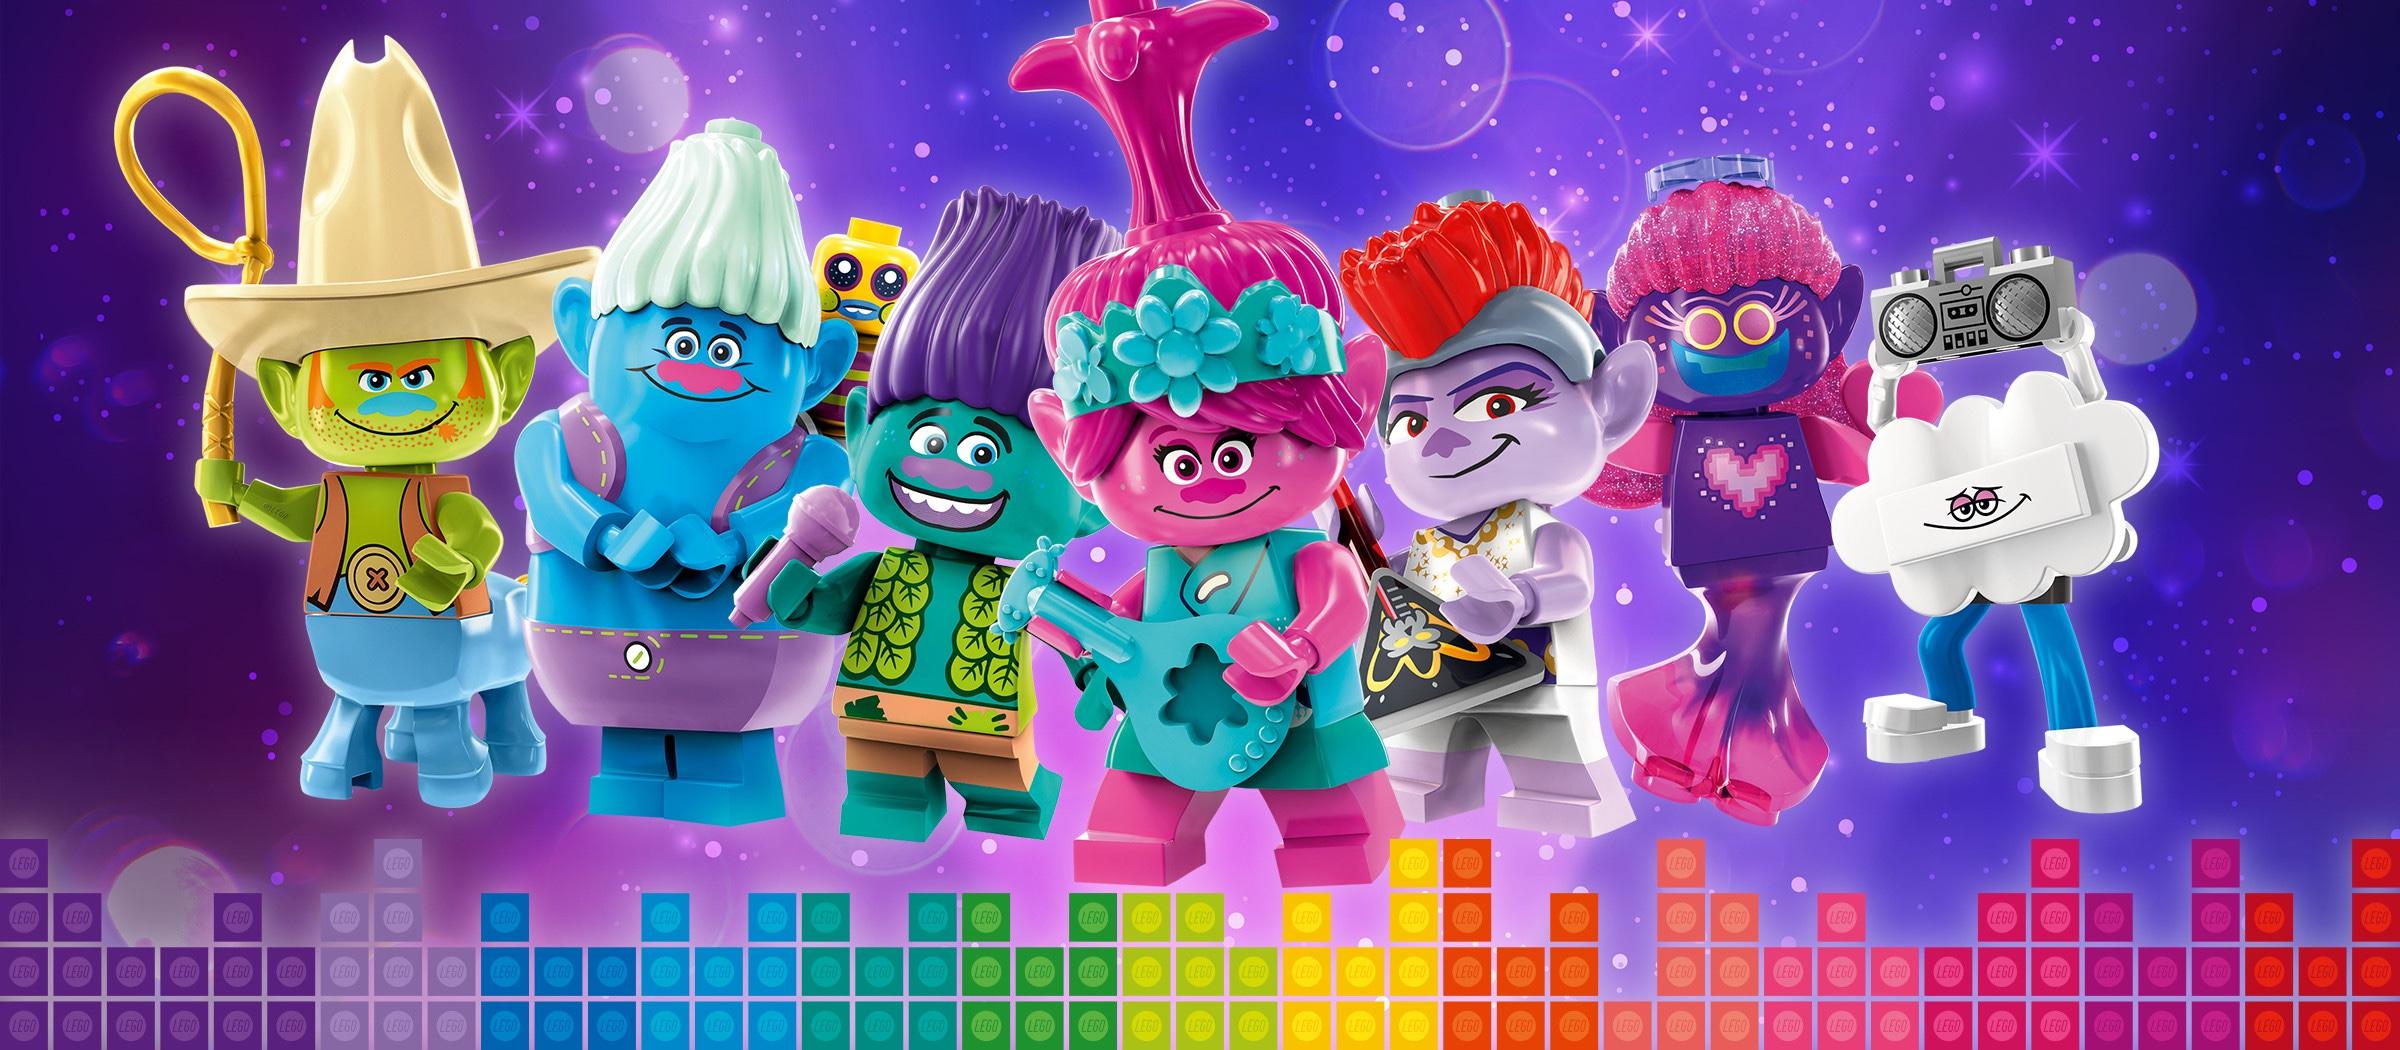 Lego Trolls World Tour About Official Lego Shop Ie